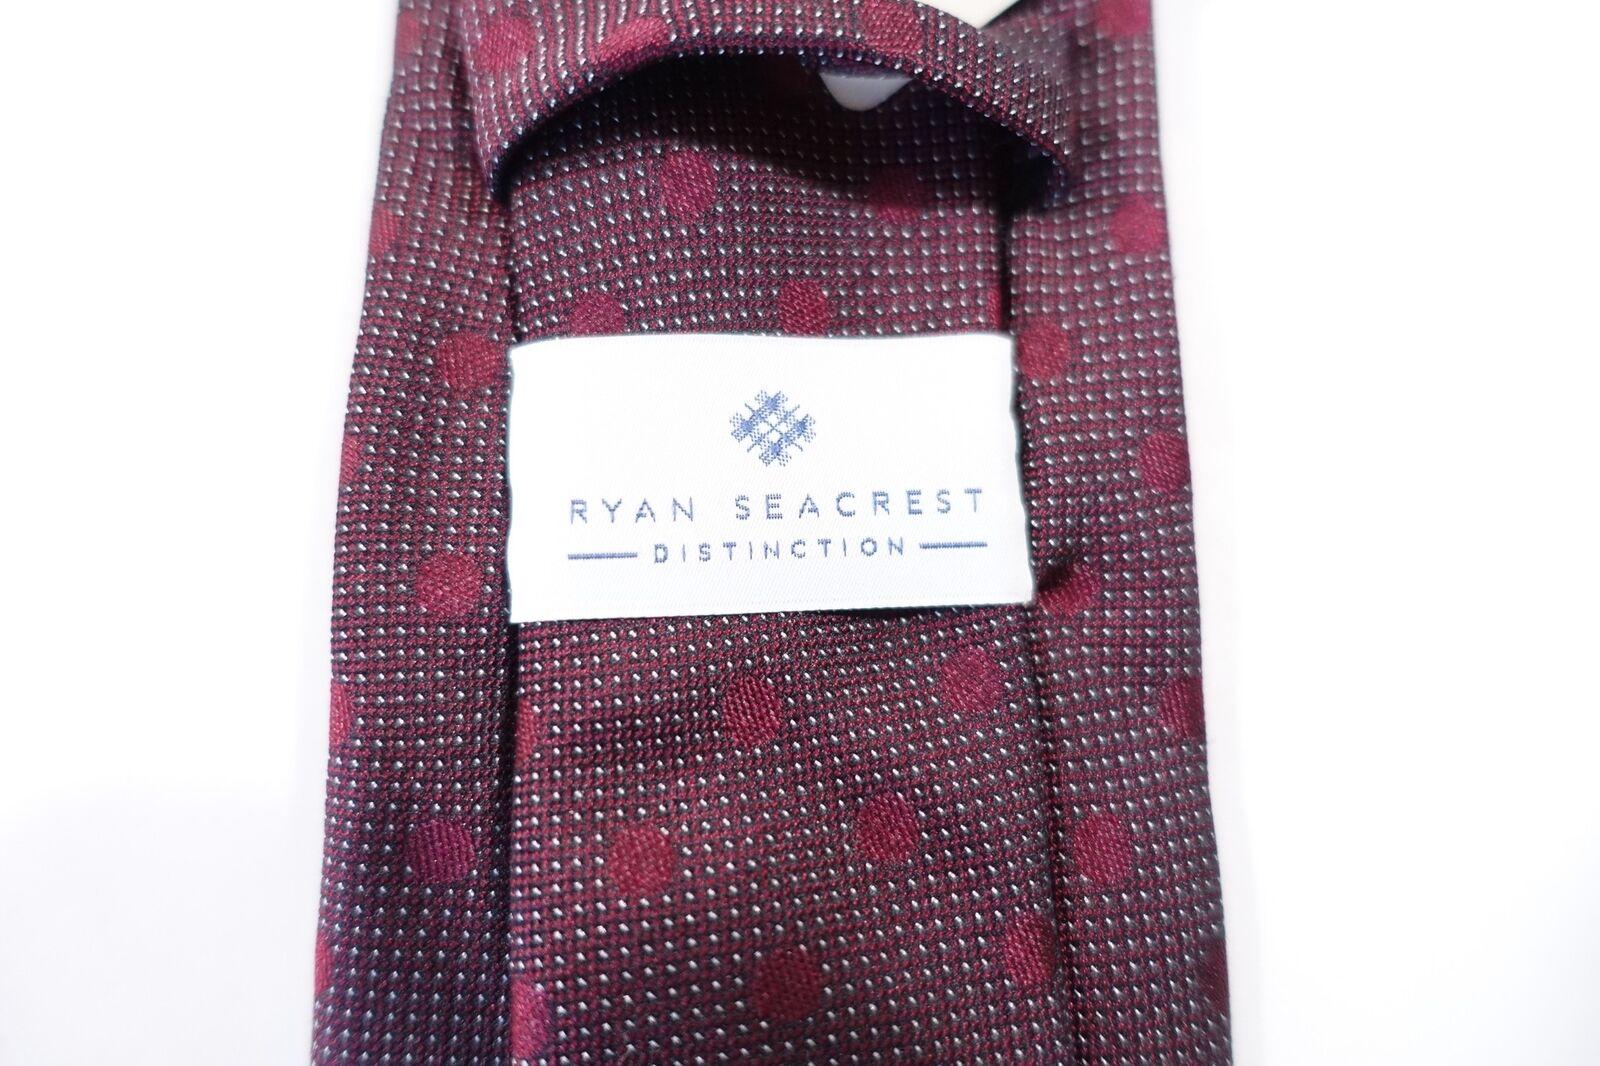 Ryan Seacrest Distinction Mens Evans Silk Polka Dot Neck Tie